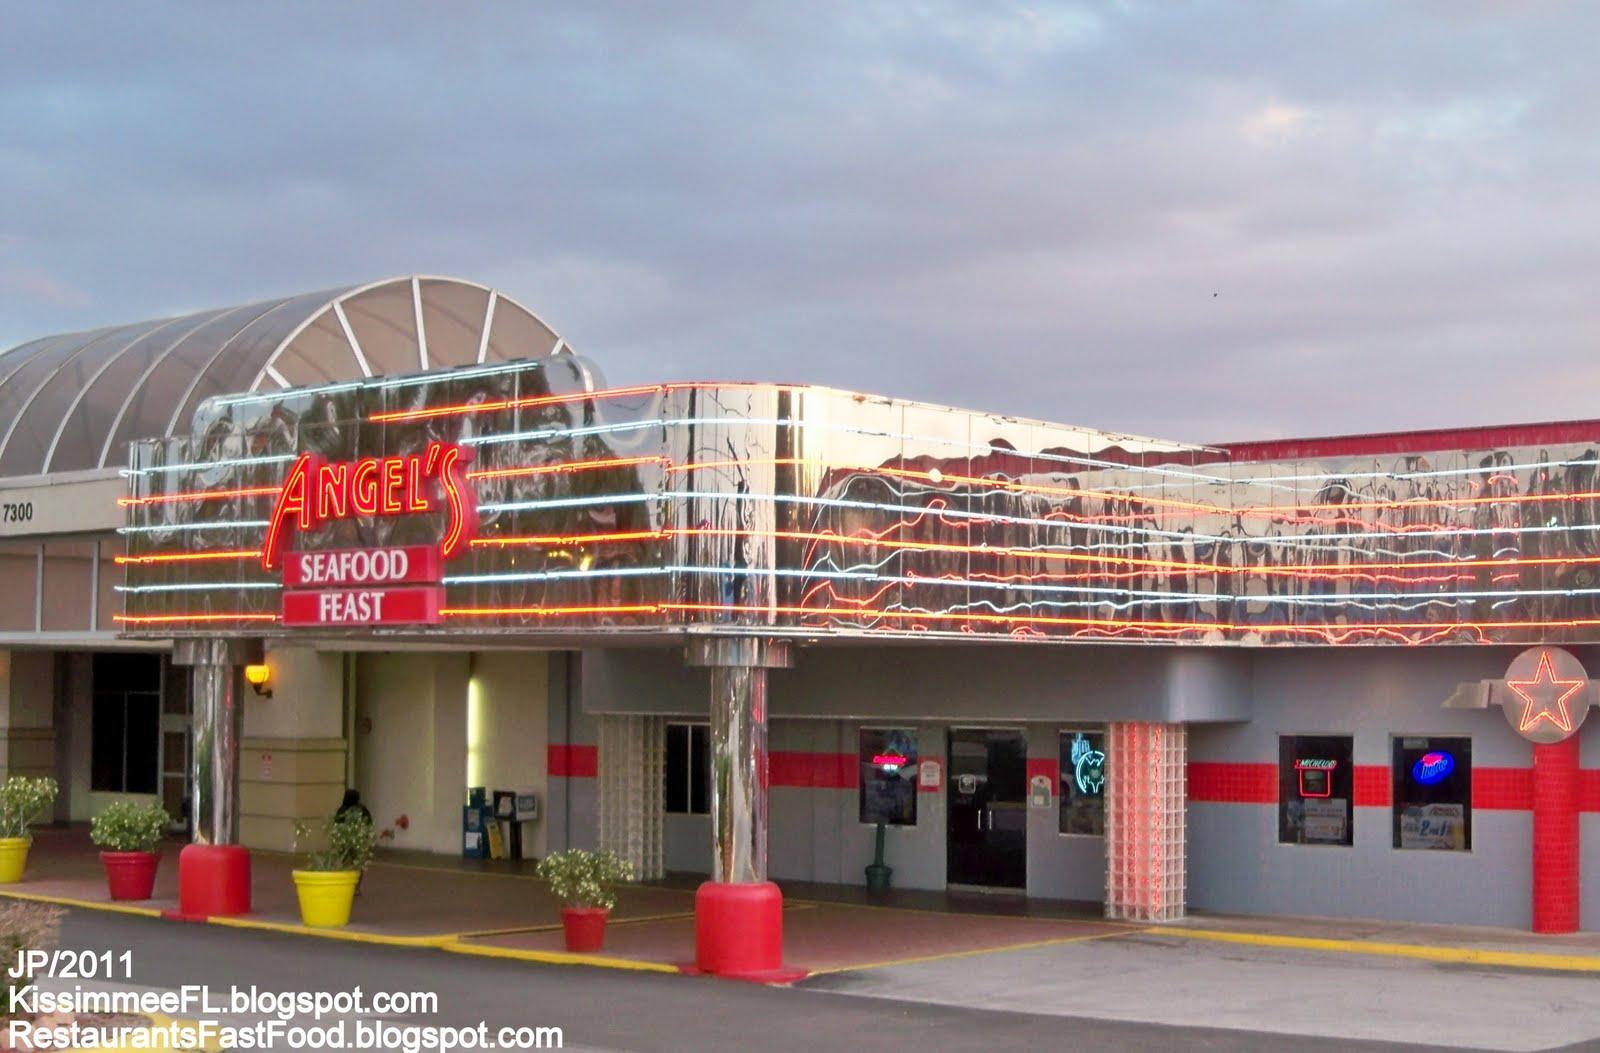 Angel S Kissimmee Florida Diner Bakery Seafood Feast Buffet Restaurant Fl Lobster Tourist Trap